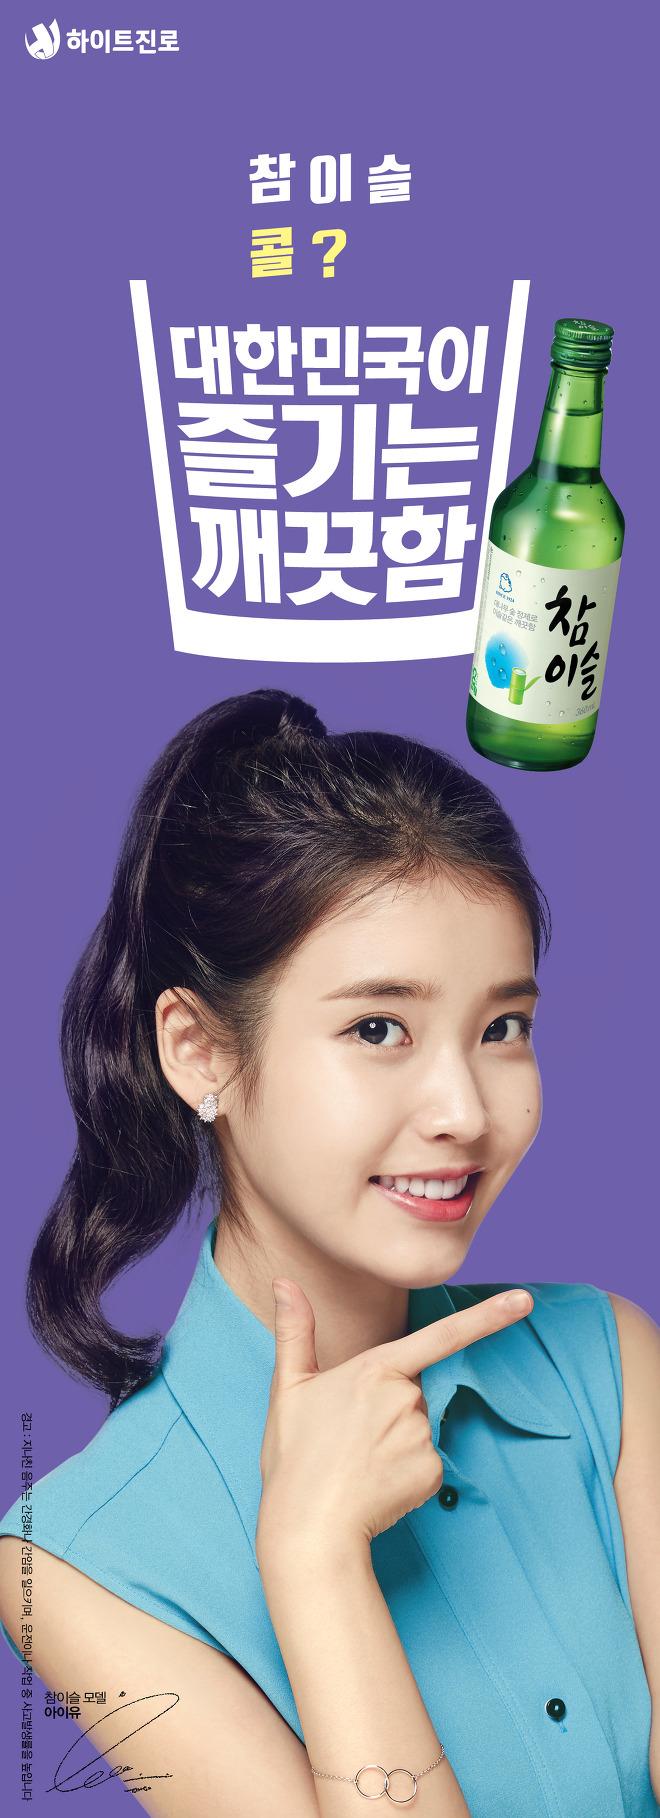 Tags: K-Pop, IU, Facial Mark, Blue Shirt, Mole, Ponytail, Soju, Korean Text, Alcohol, Chamisul